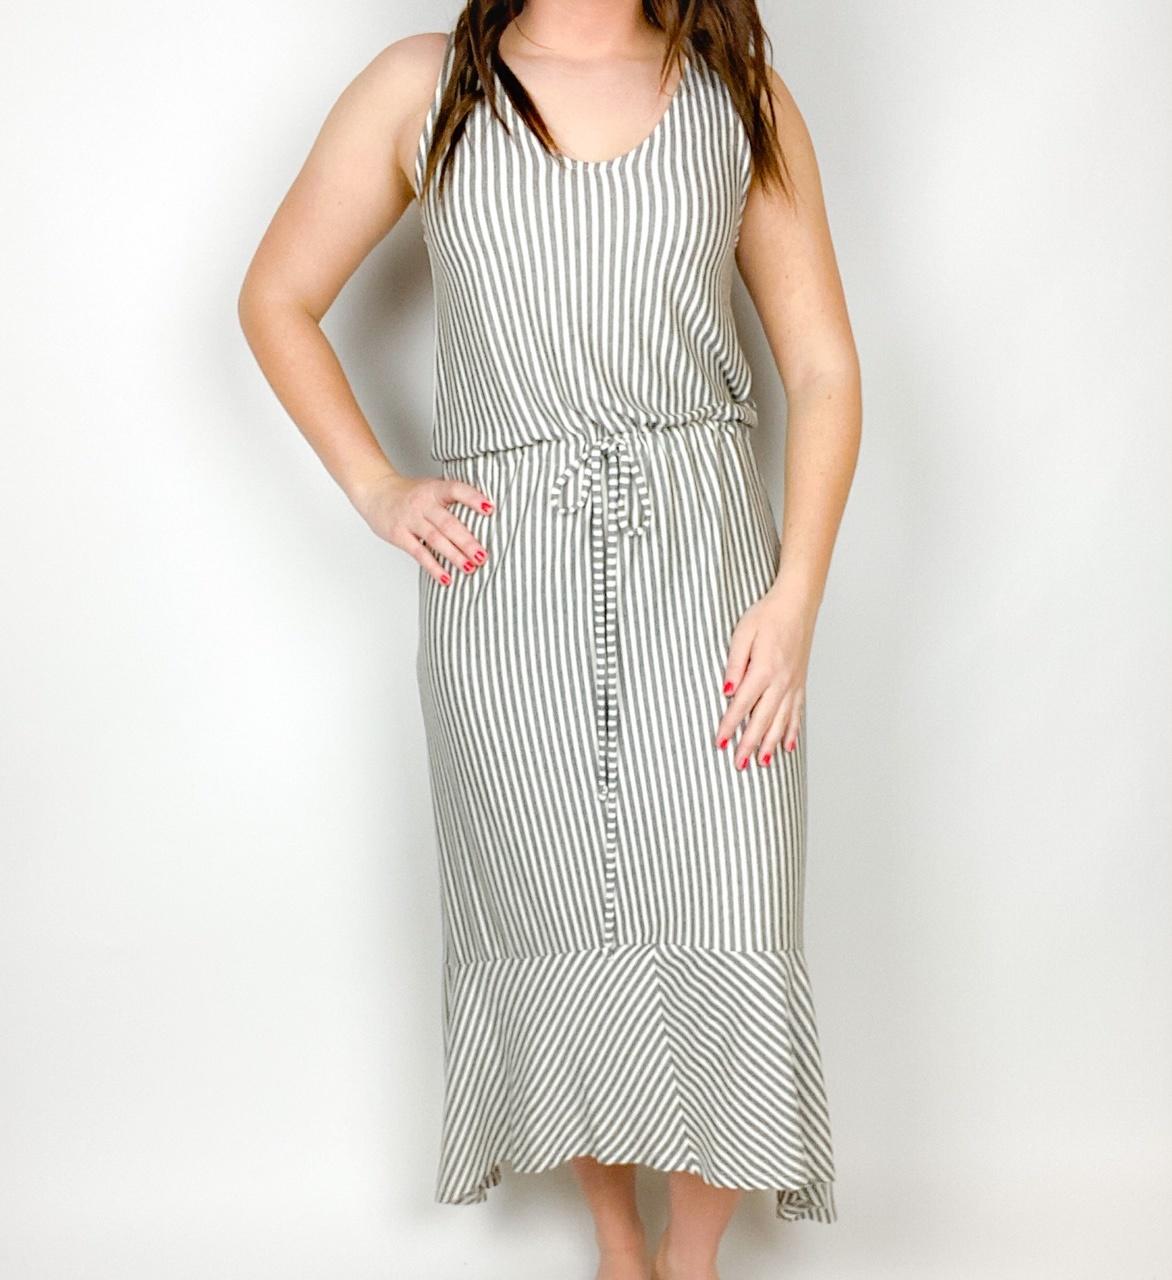 coa COA Ivy/Blk S/L Dress ACD50491